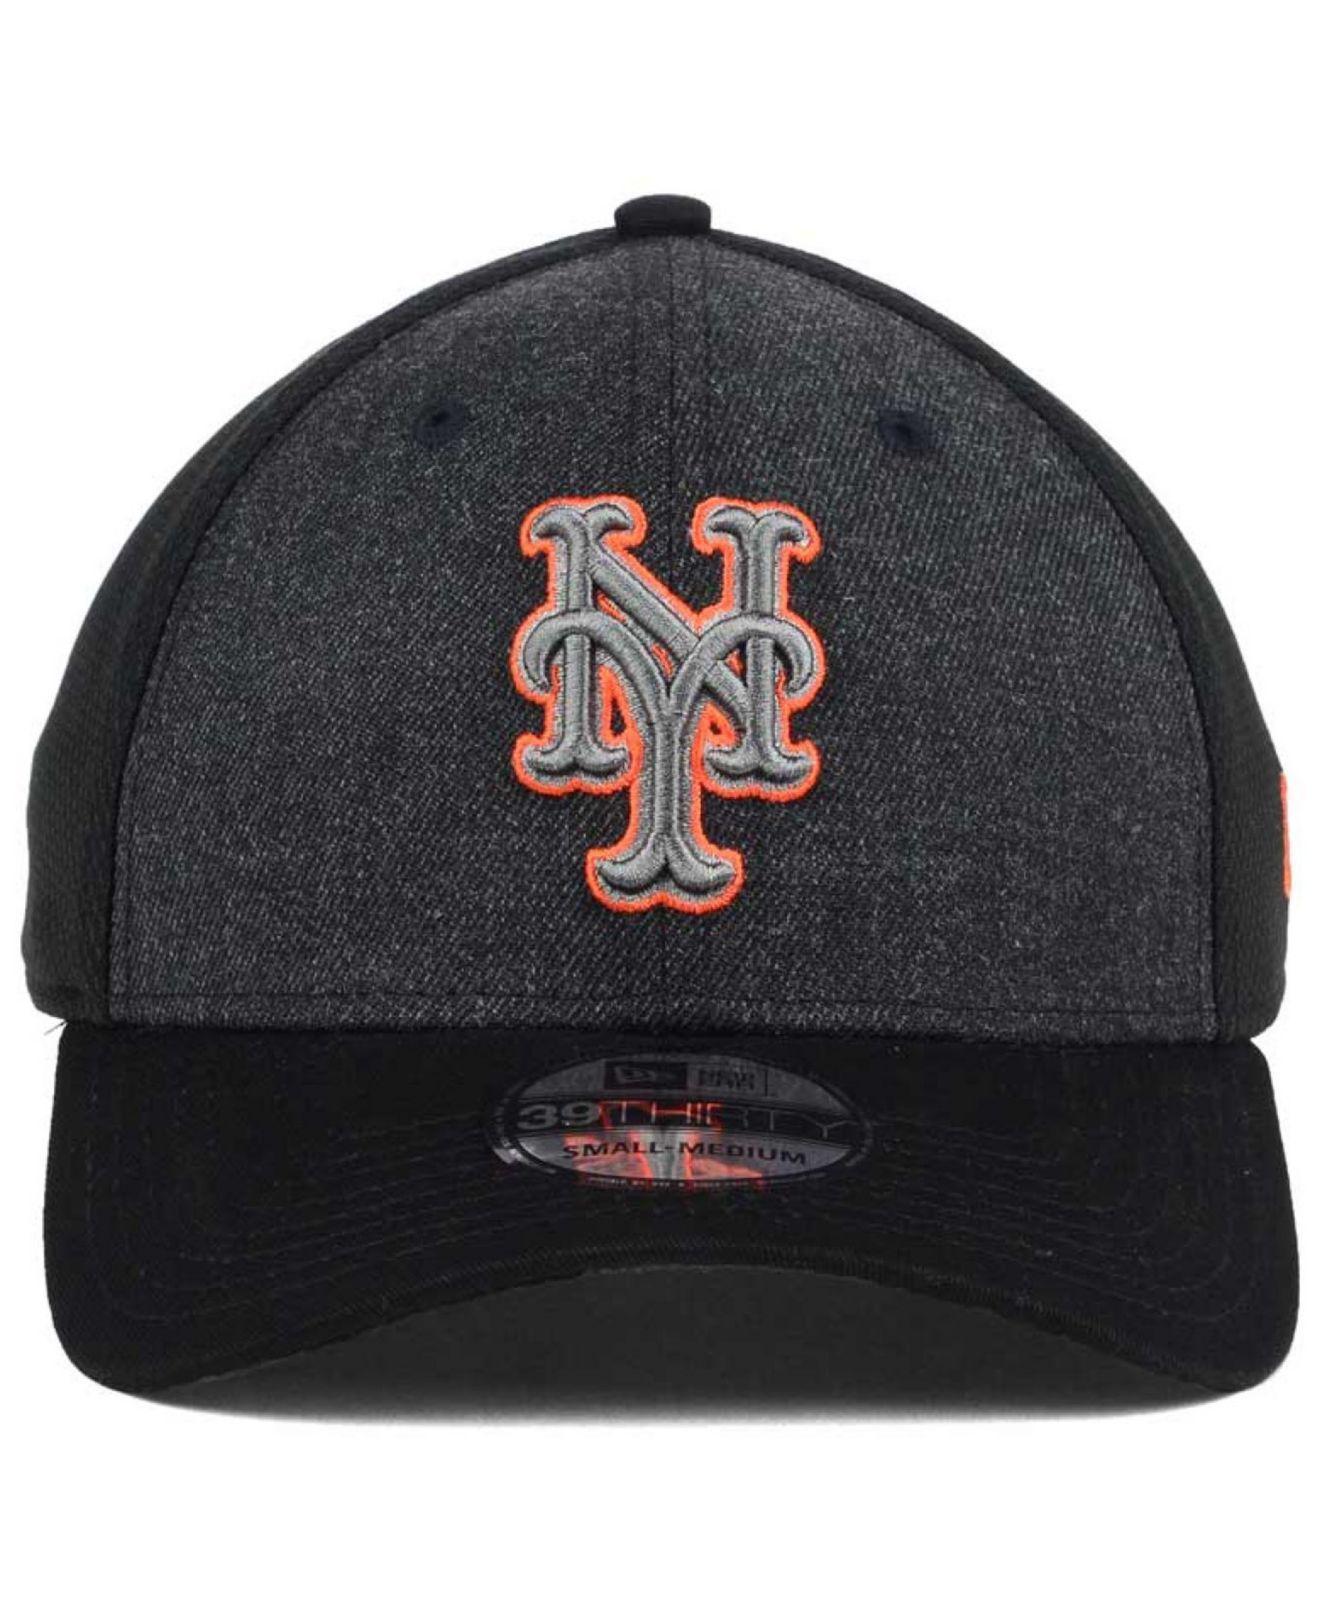 bce7dddc51b Lyst - Ktz New York Mets Black Heathered 39thirty Cap in Black for Men